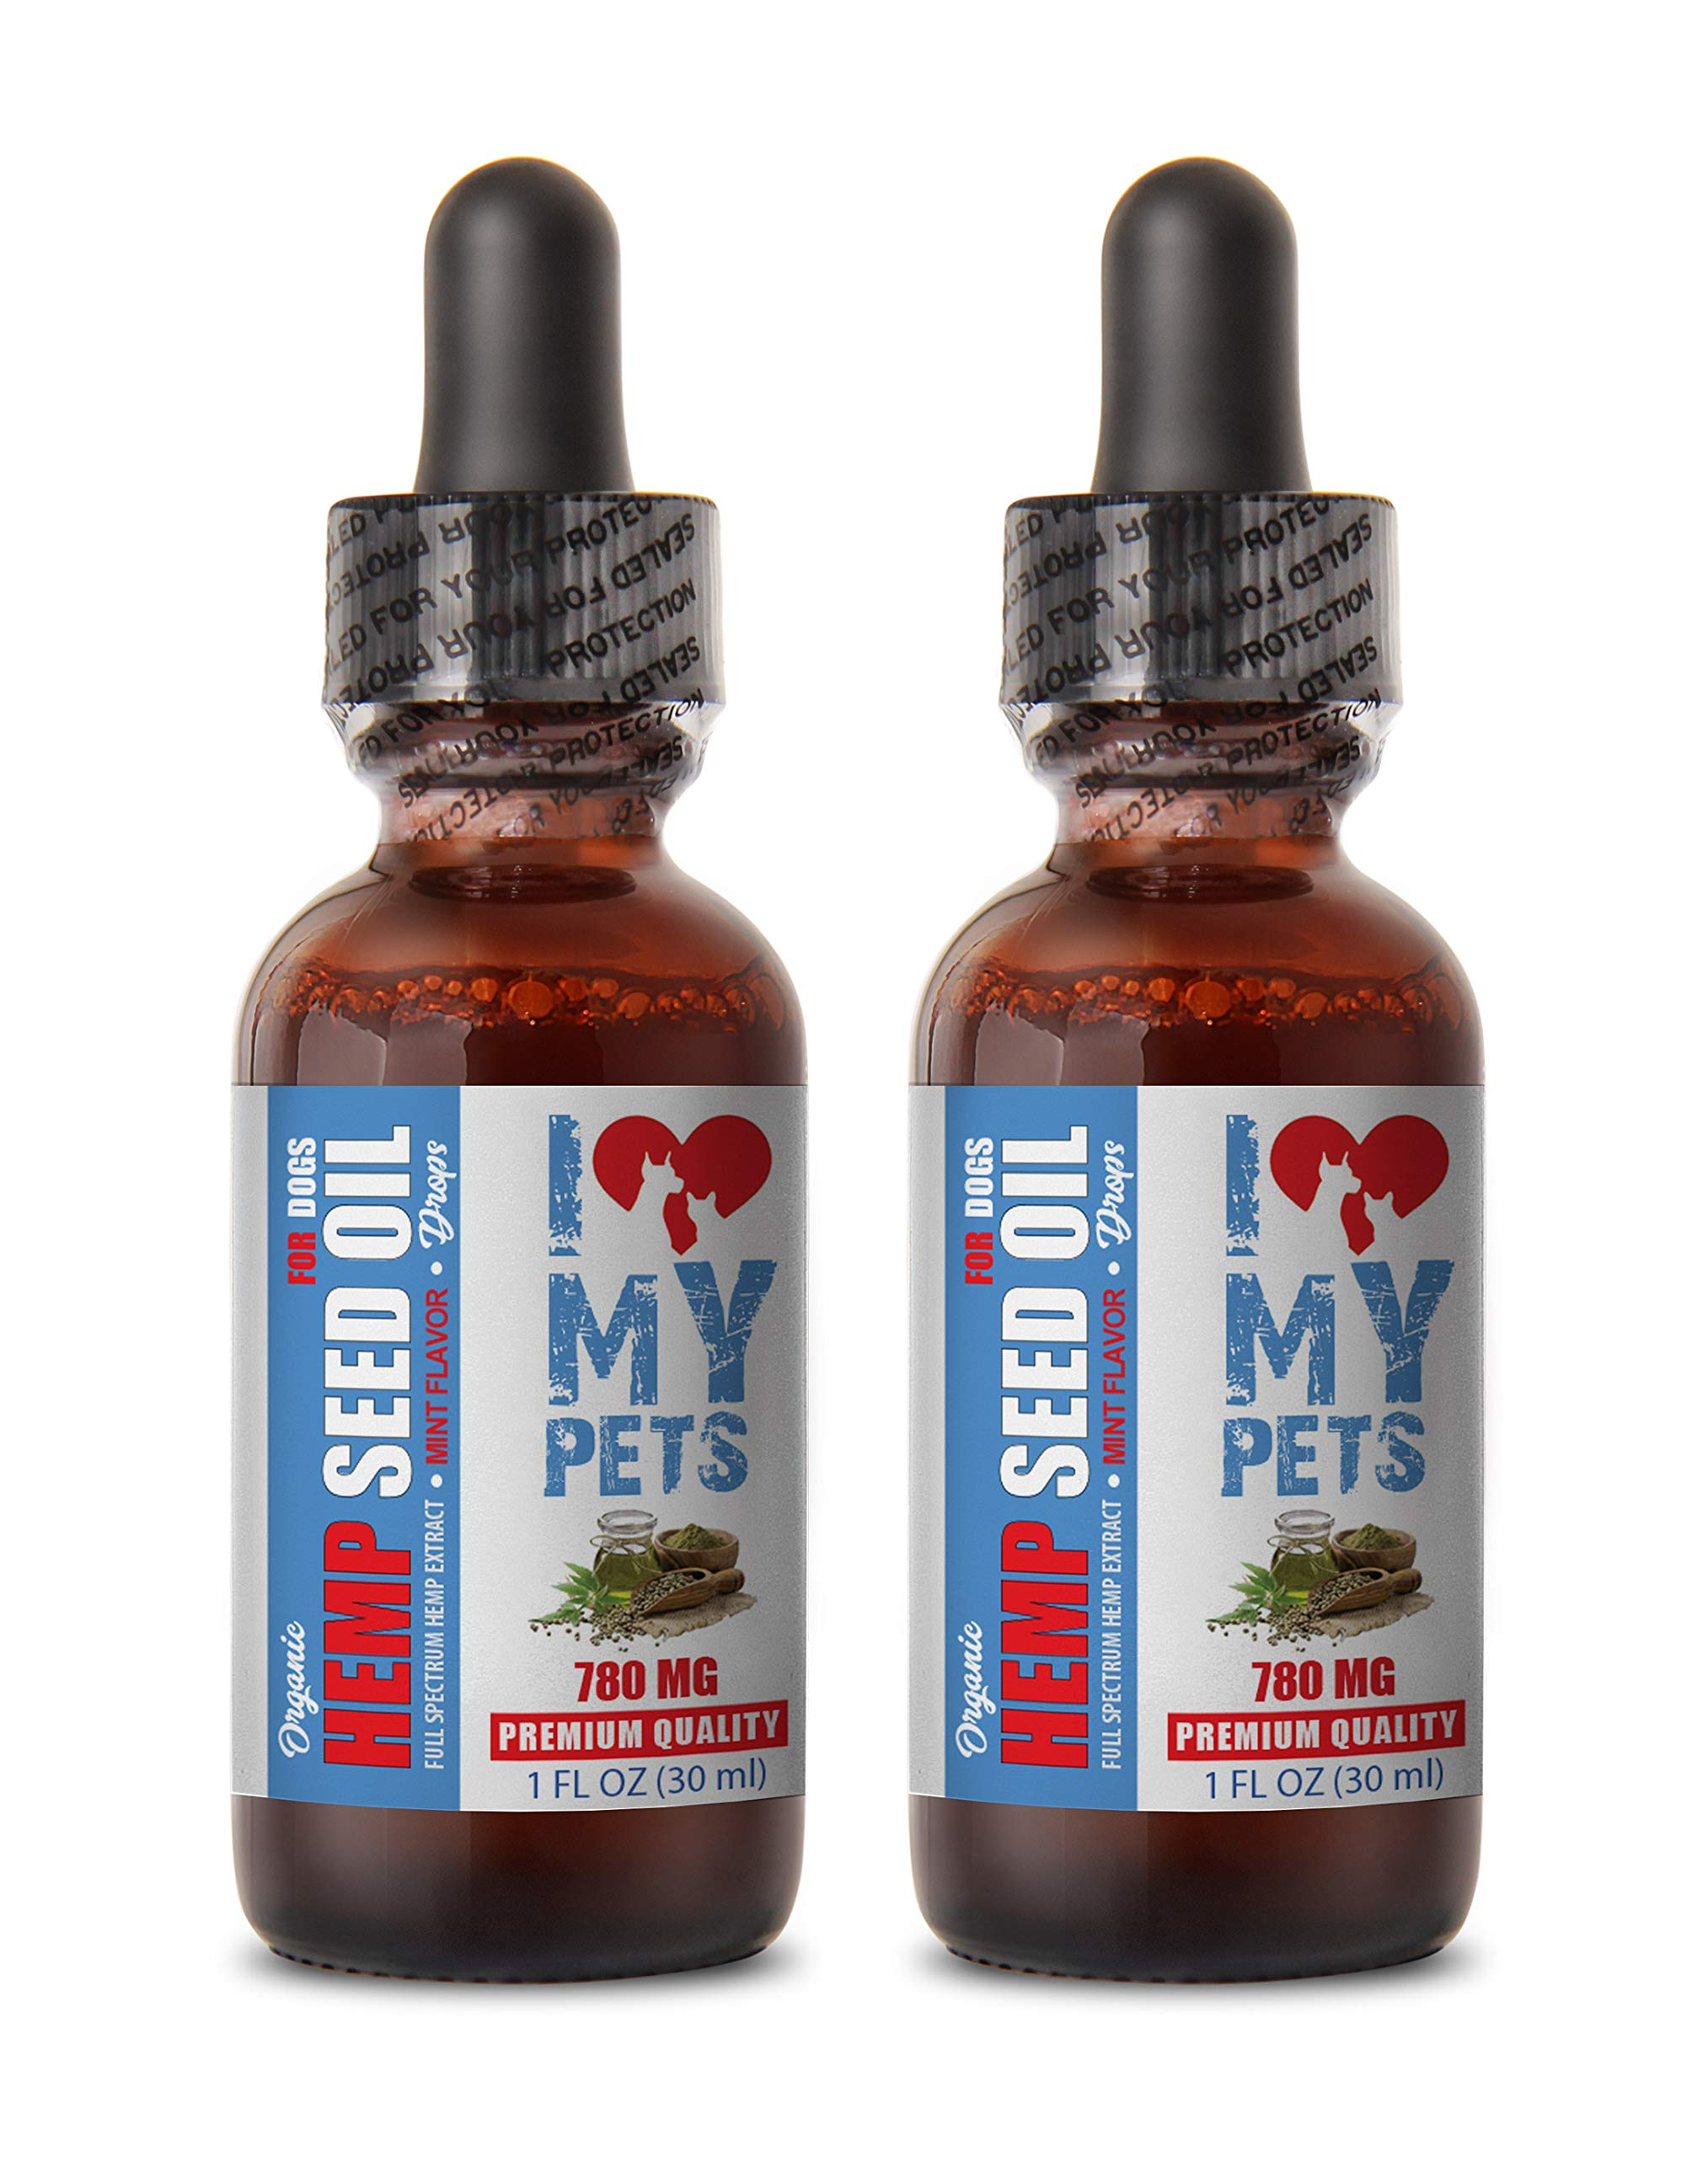 I LOVE MY PETS LLC Dog Stress and Anxiety Relief - Dog Hemp Seed Oil Drops - Relaxing Flavor - Omega 3 6 9 Fatty ACIDS - Full Health Control - Dog Hemp Hip - 2 Bottles (60 ML) by I LOVE MY PETS LLC